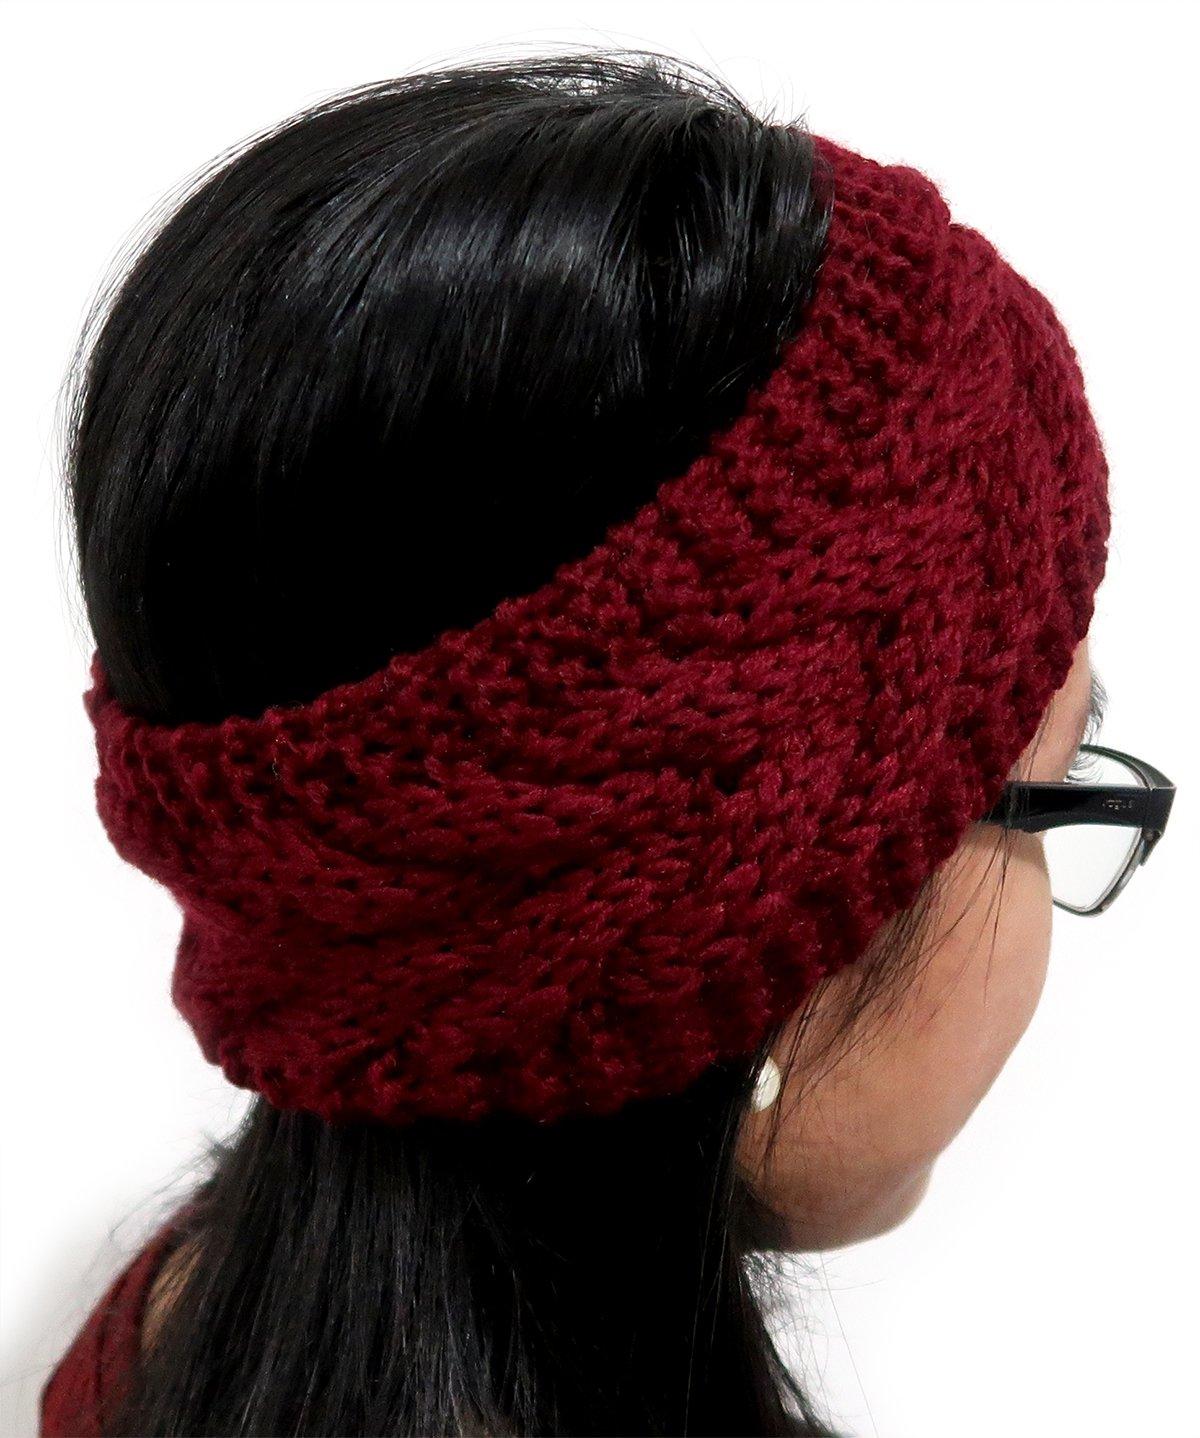 Wine Red Burgundy Women's 2018 Fashion Knit Crochet Twist Headband Ear Warmer Maroon Hair Band Turban Wrap